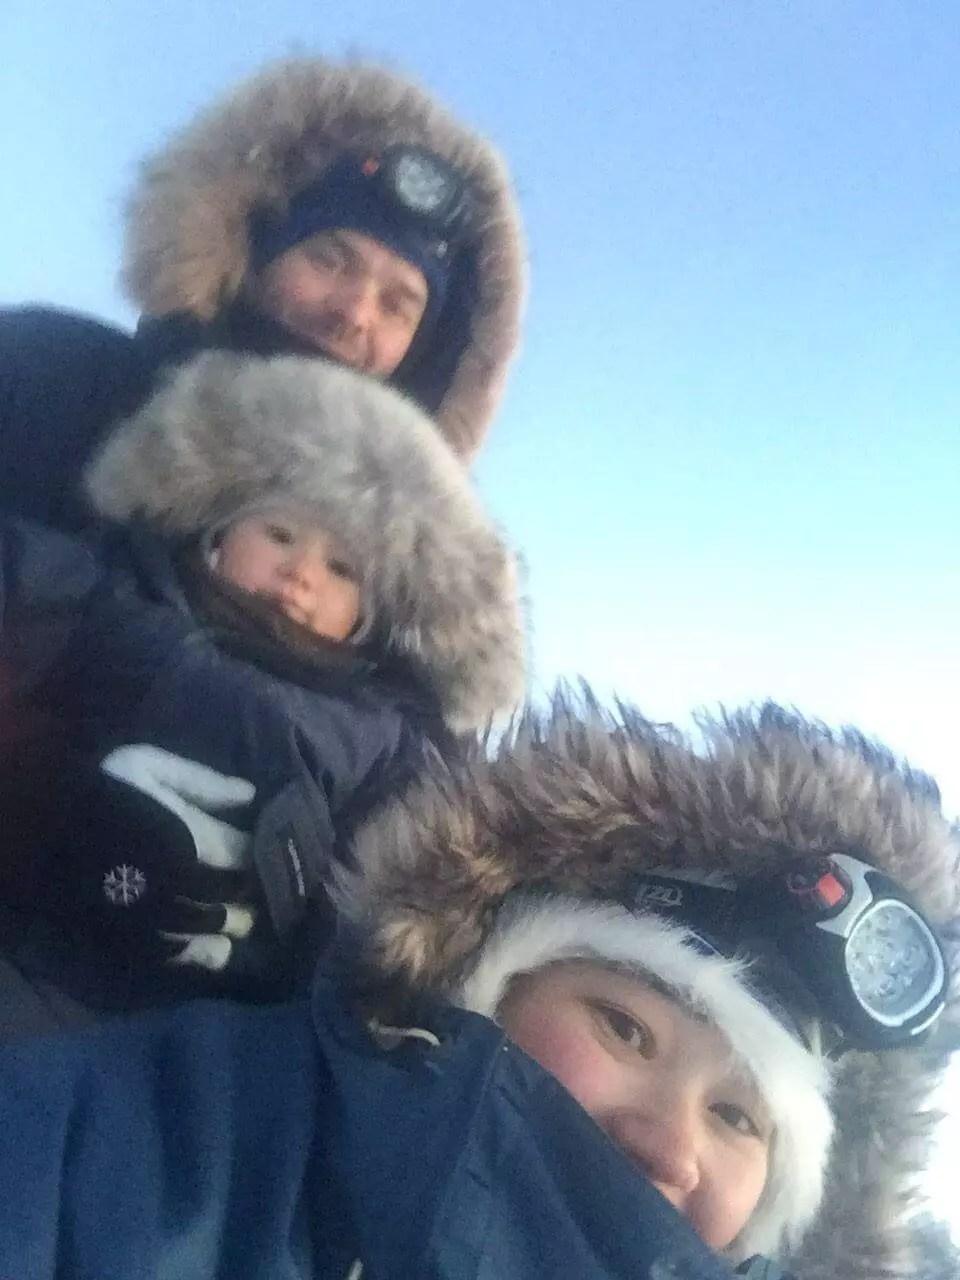 family dog sledding trip